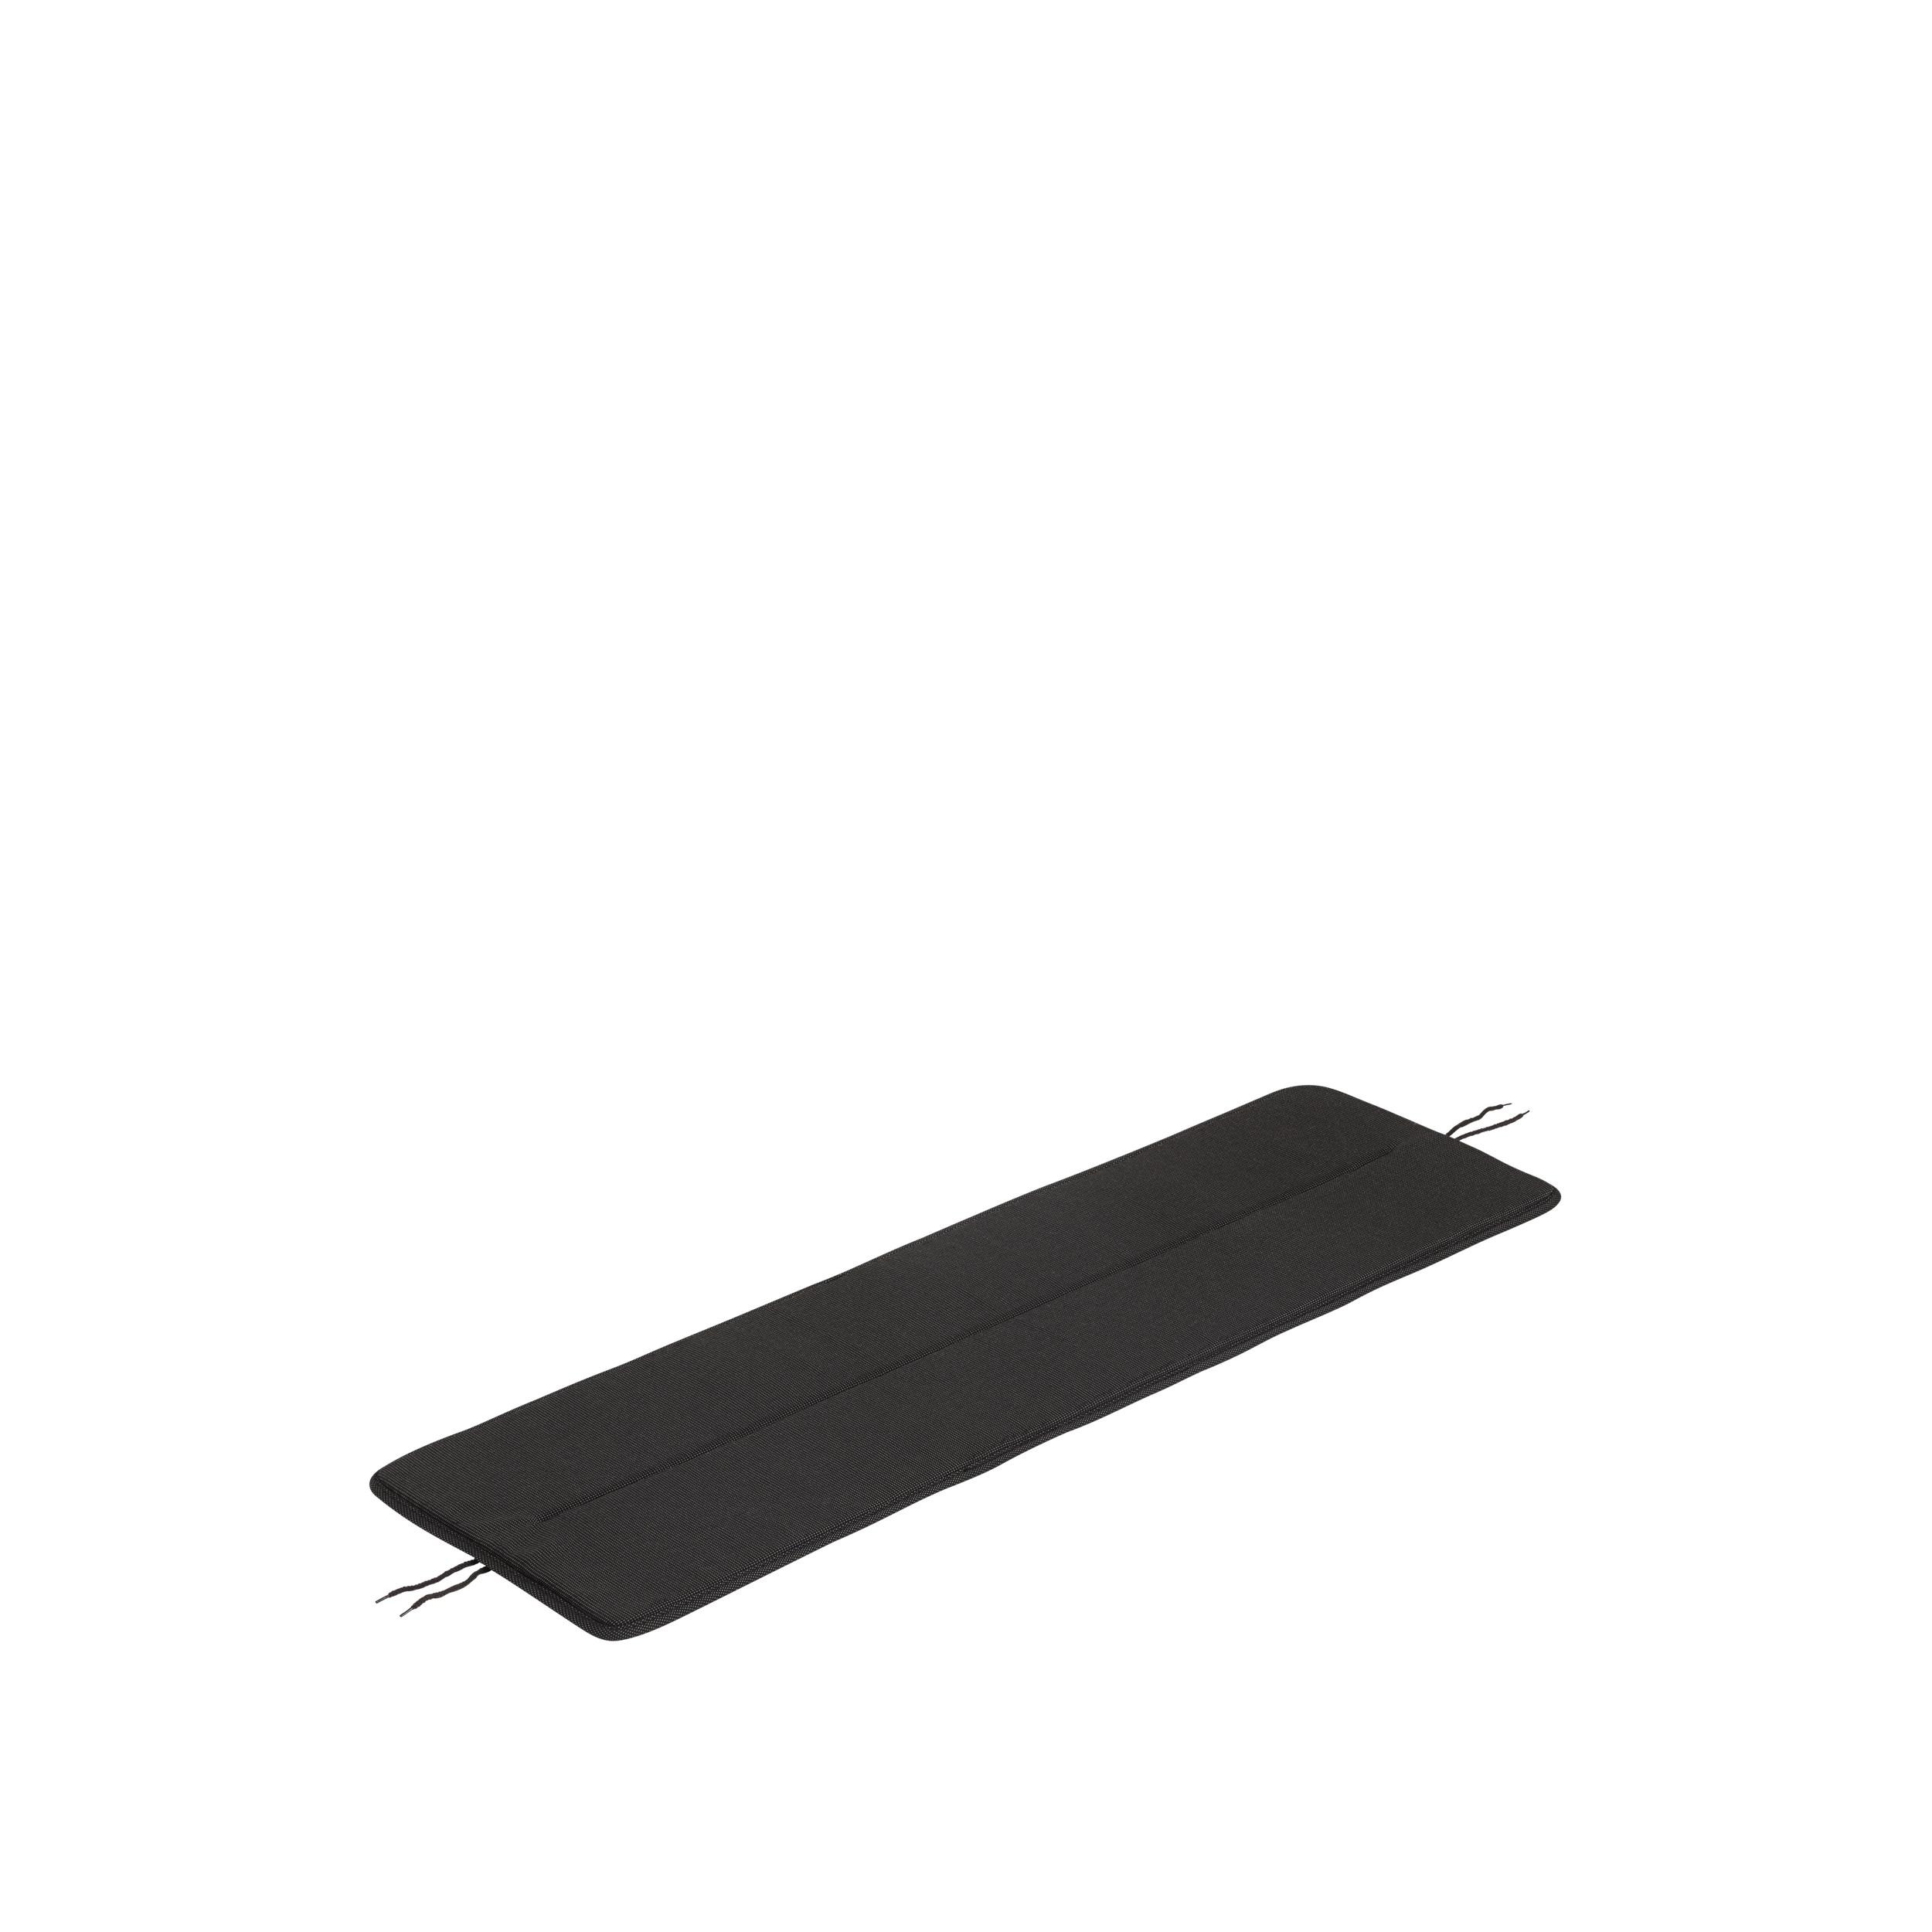 Linear Steel bench seat pad, 110 cm